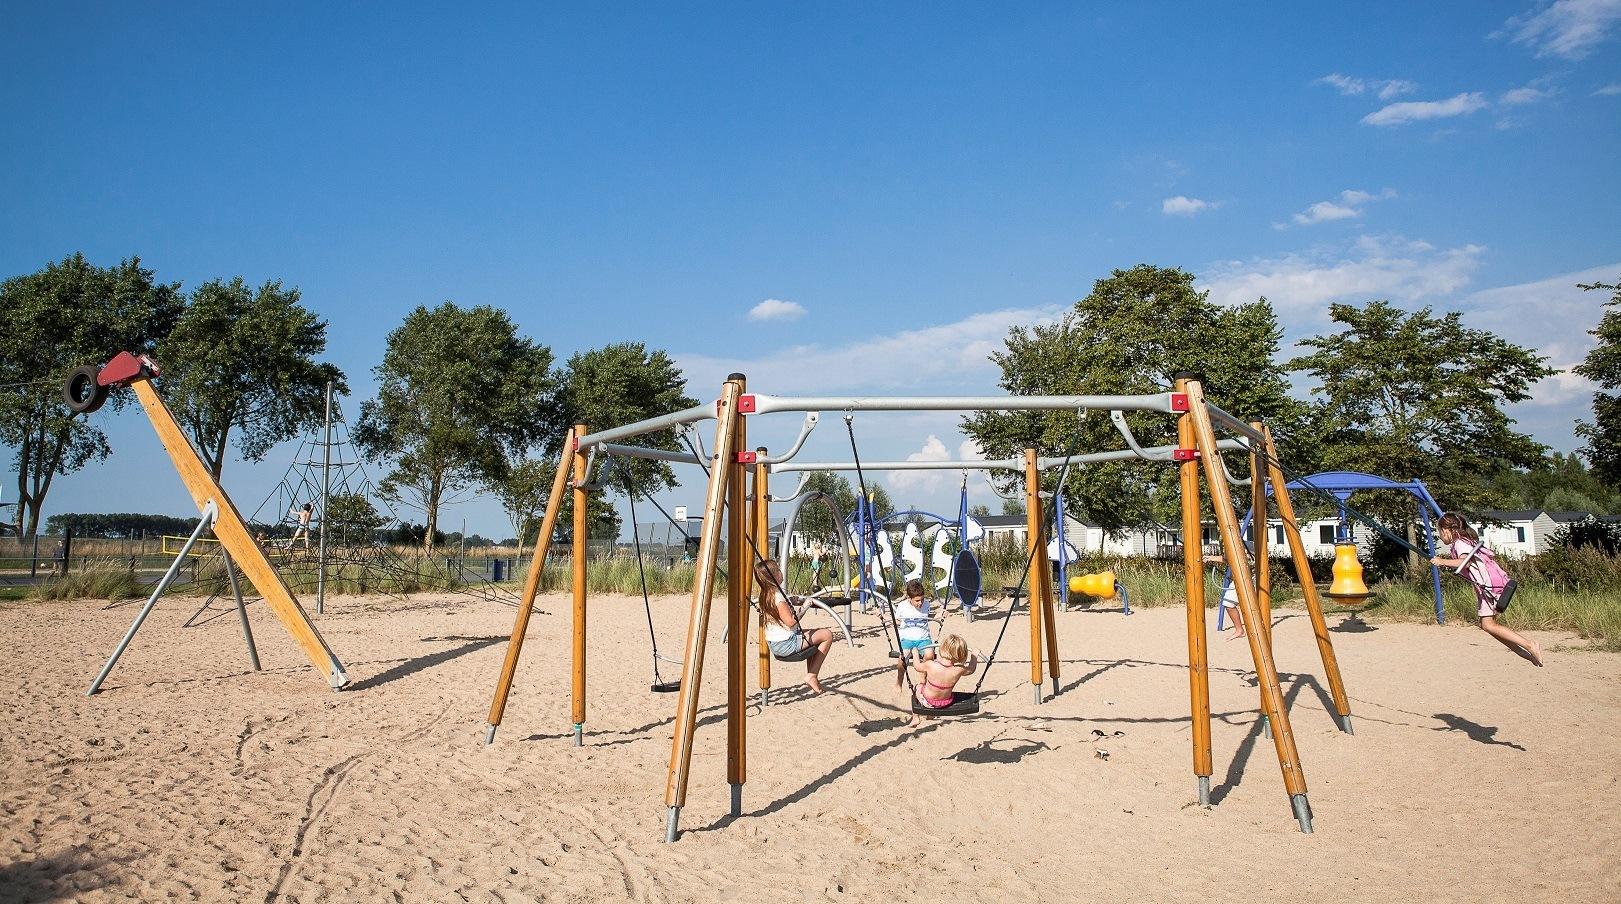 Belgie-Nieuwpoort-Kompas%20Camping%20Nieuwpoort-ExtraLarge Campings België